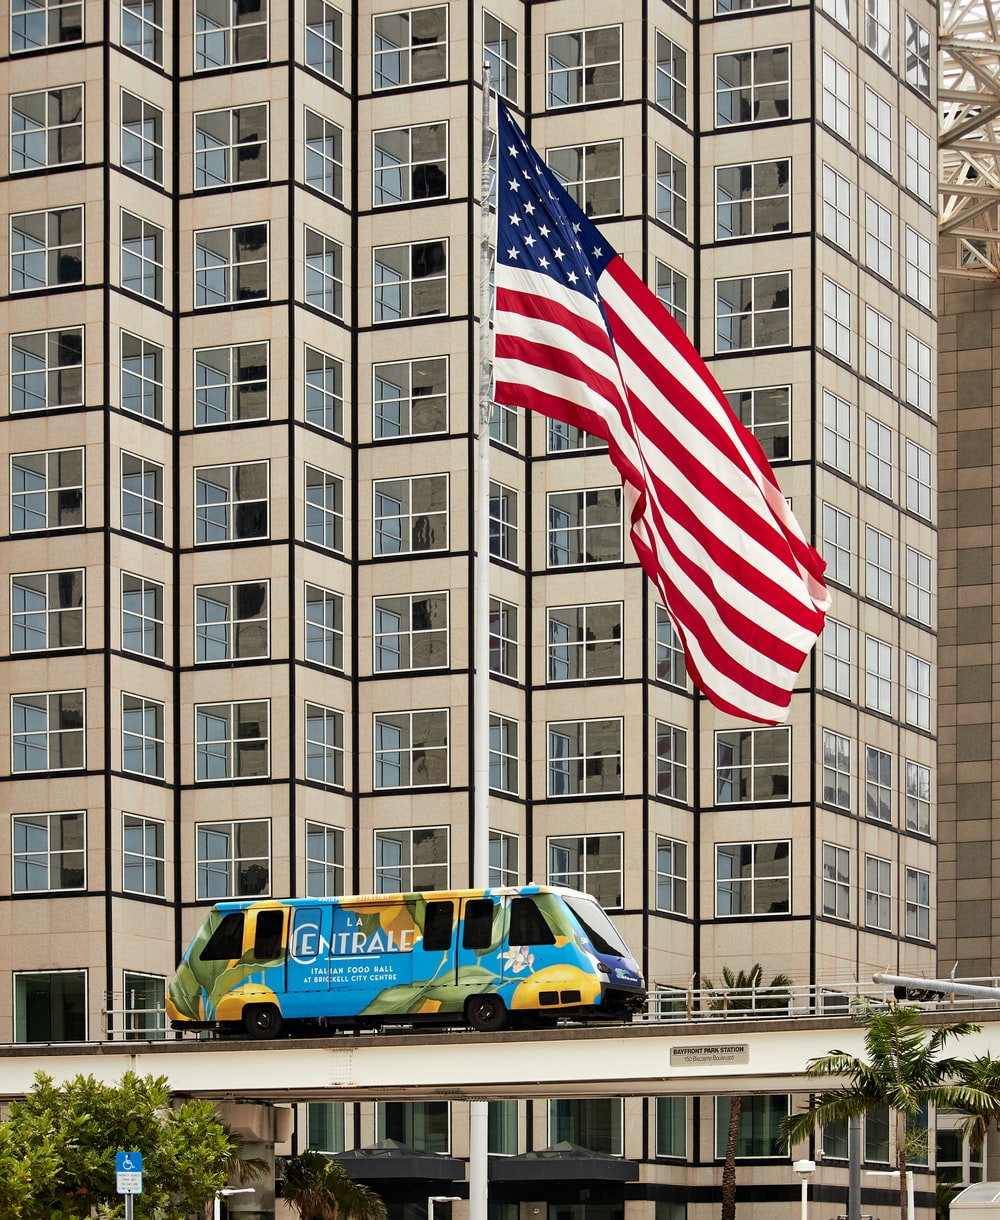 Centrale bus passing through on bridge near USA flag